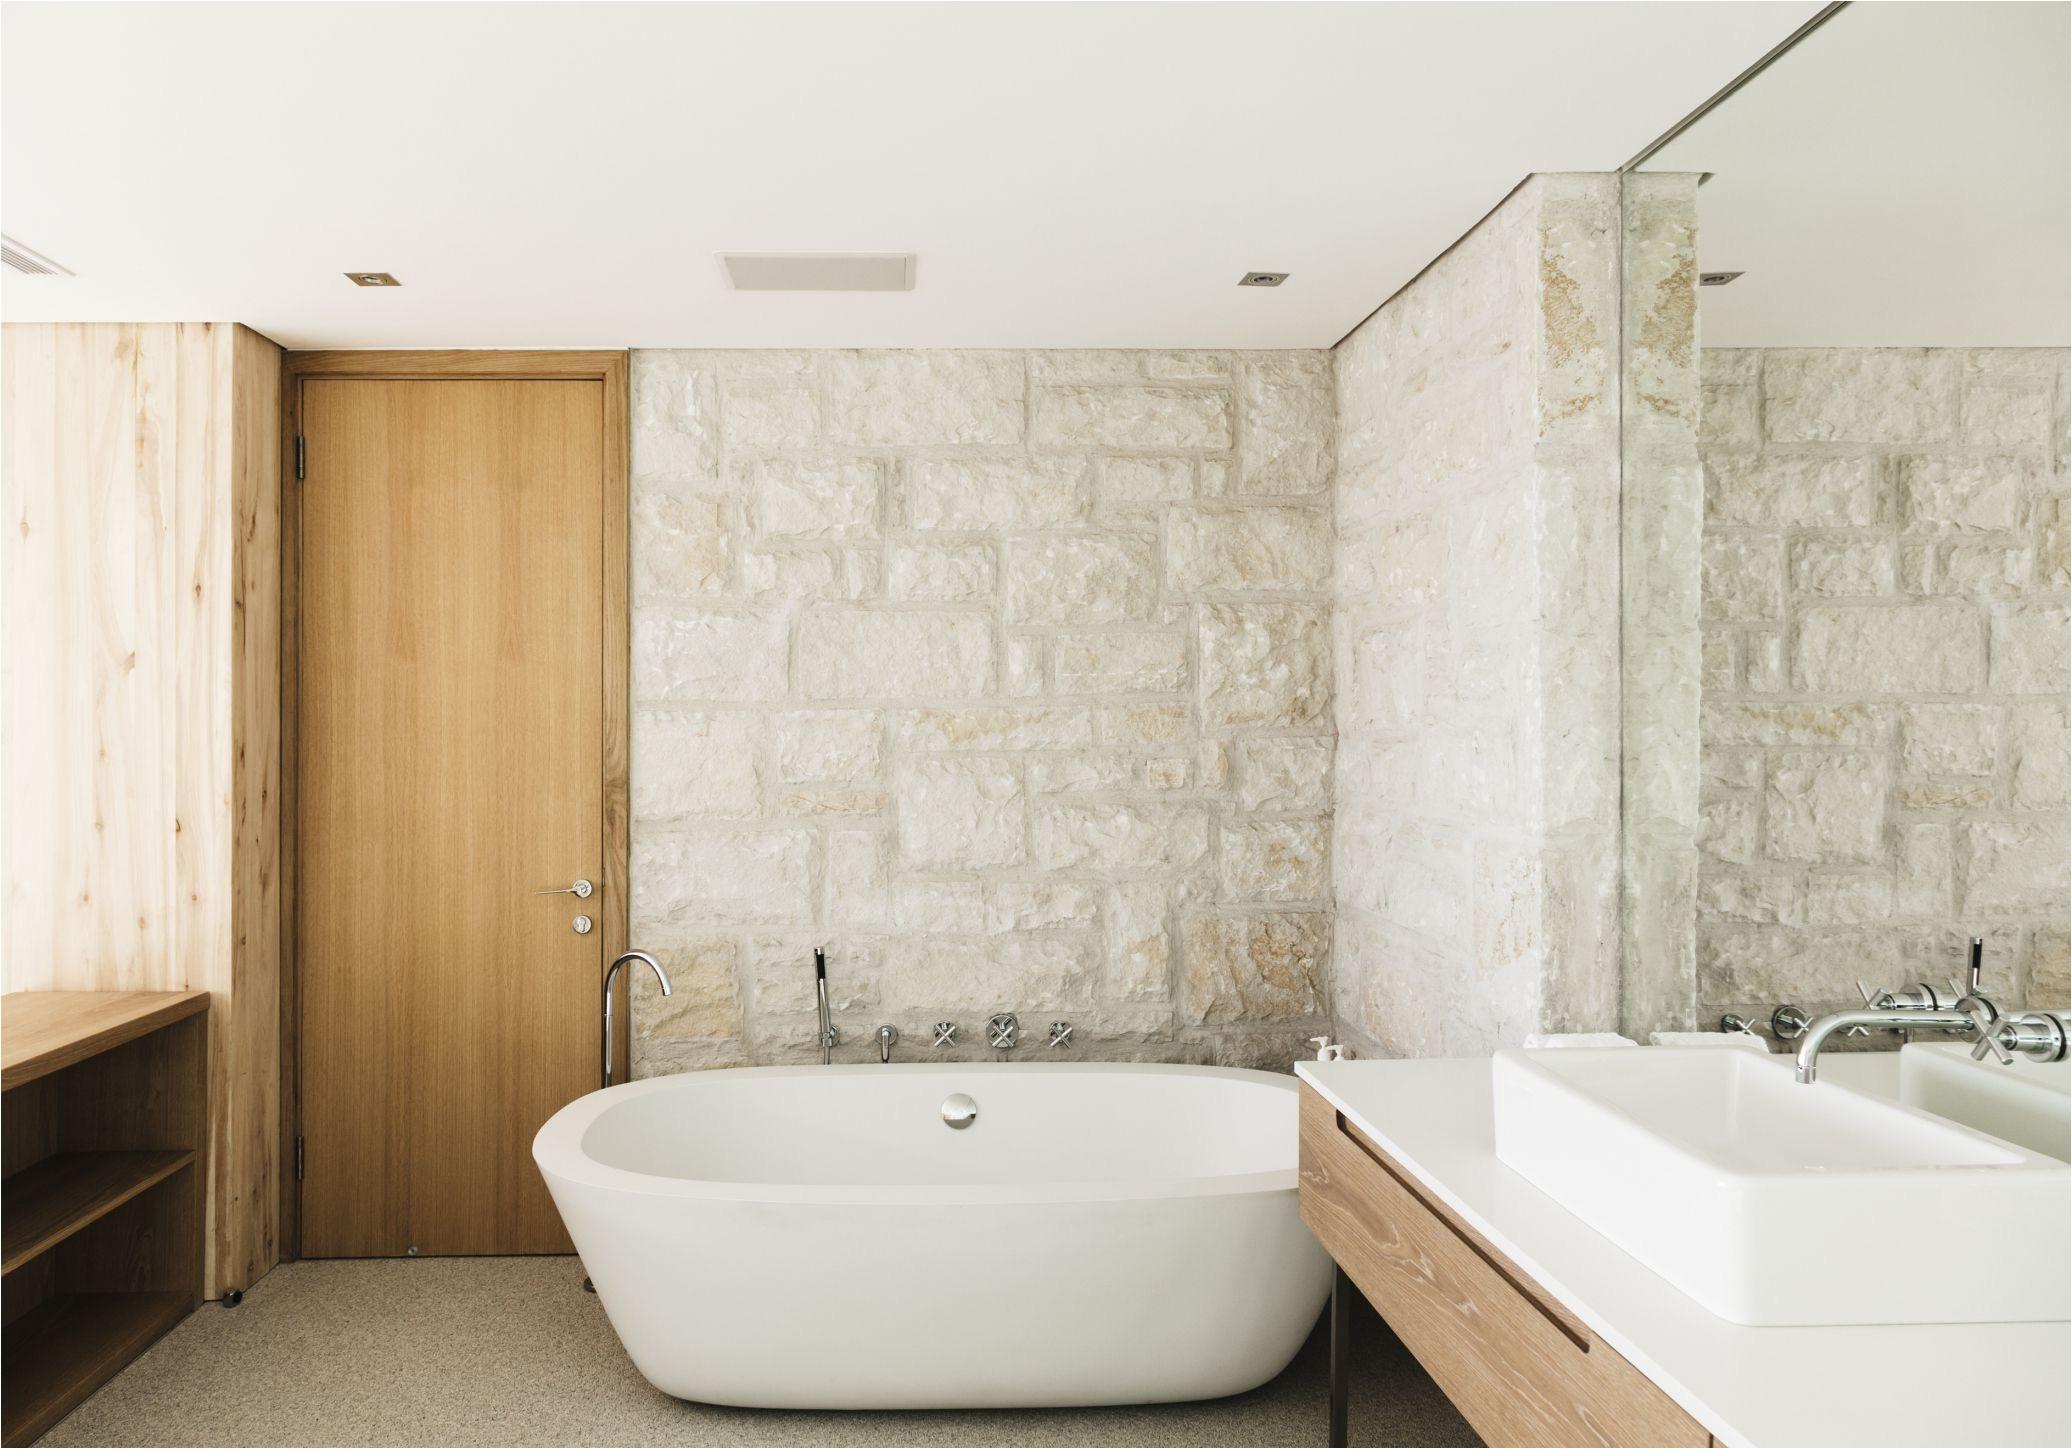 Reglaze Shower Tile Diy Vs Professional Bathtub Shower Refinishing ...